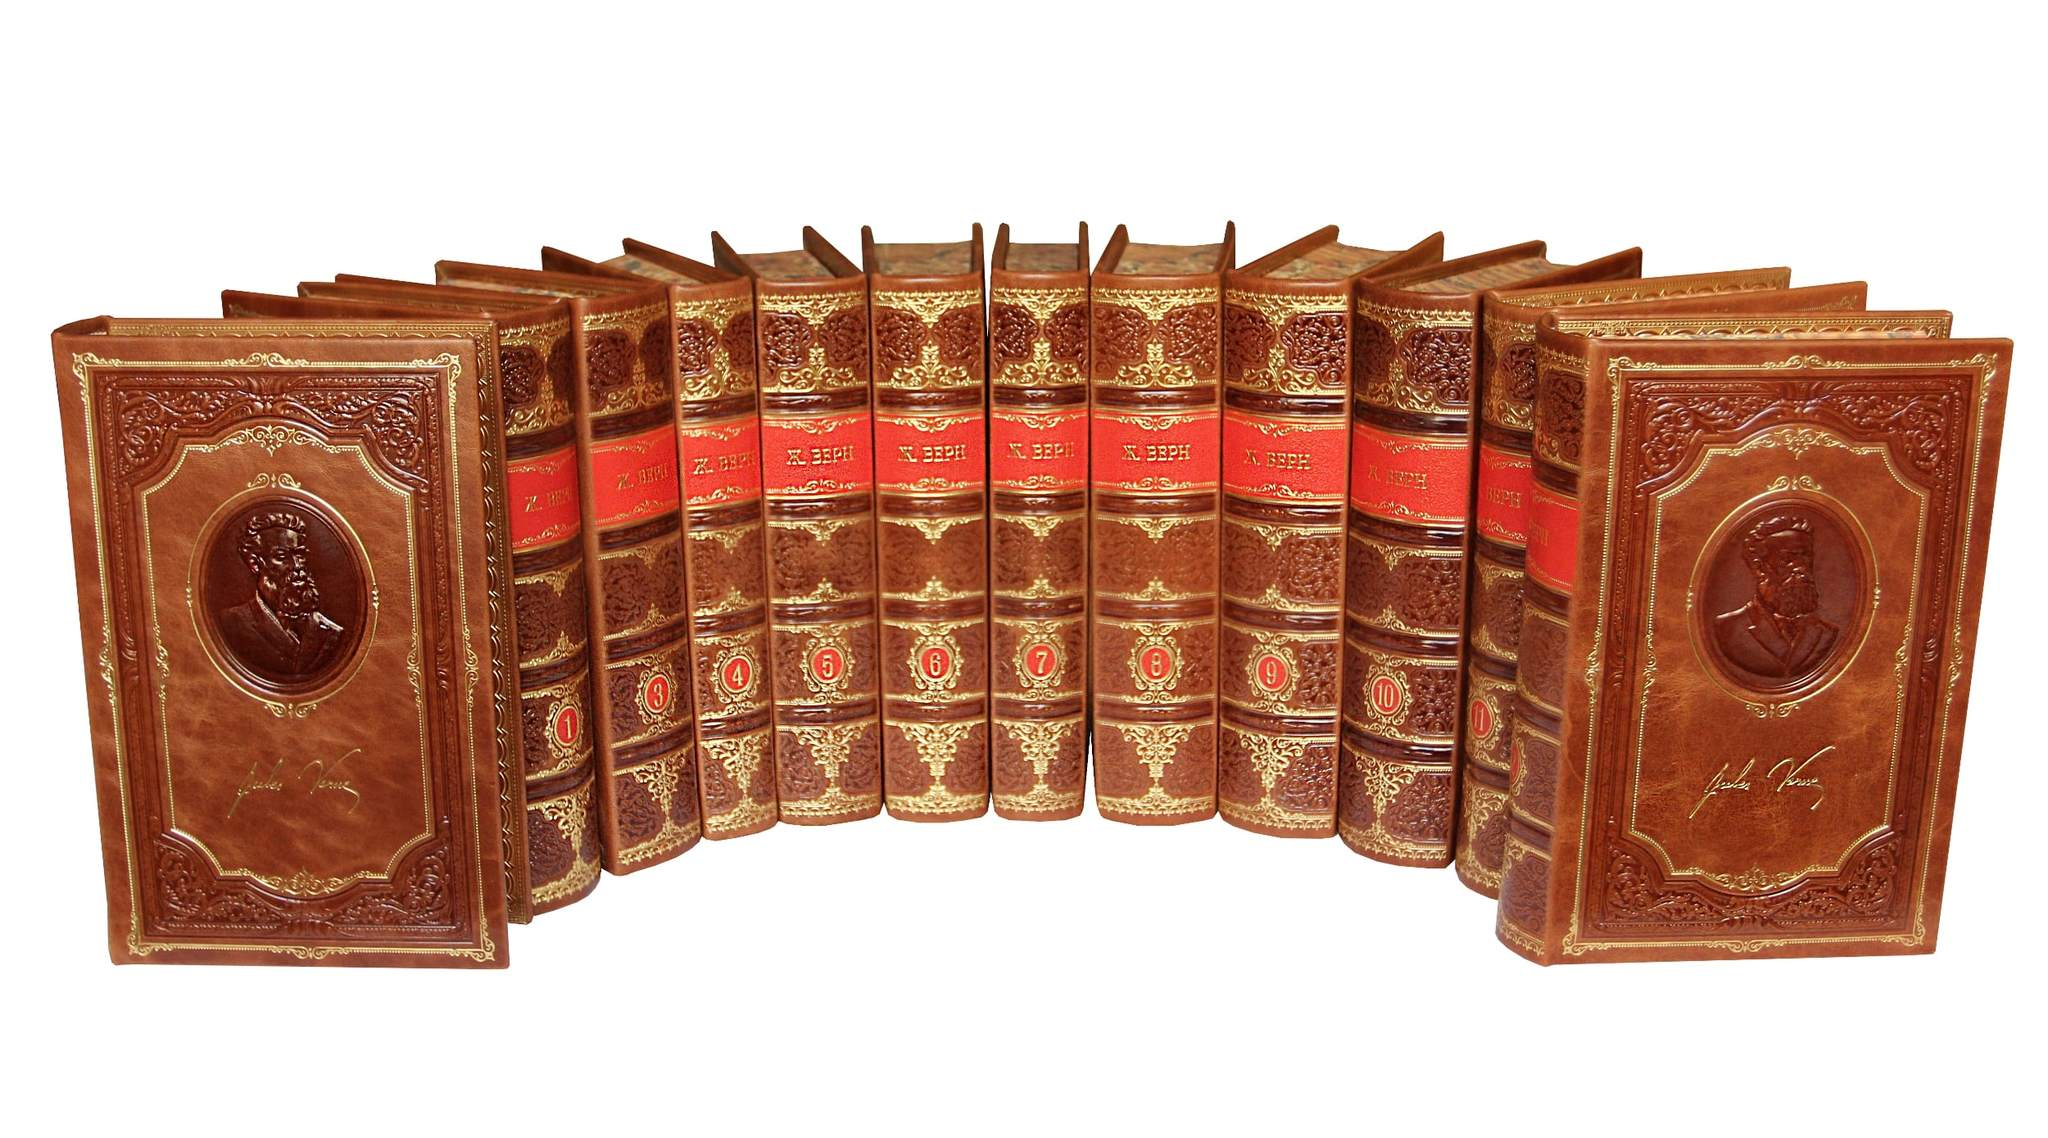 Верн Ж. Собрание сочинений в 12 томах